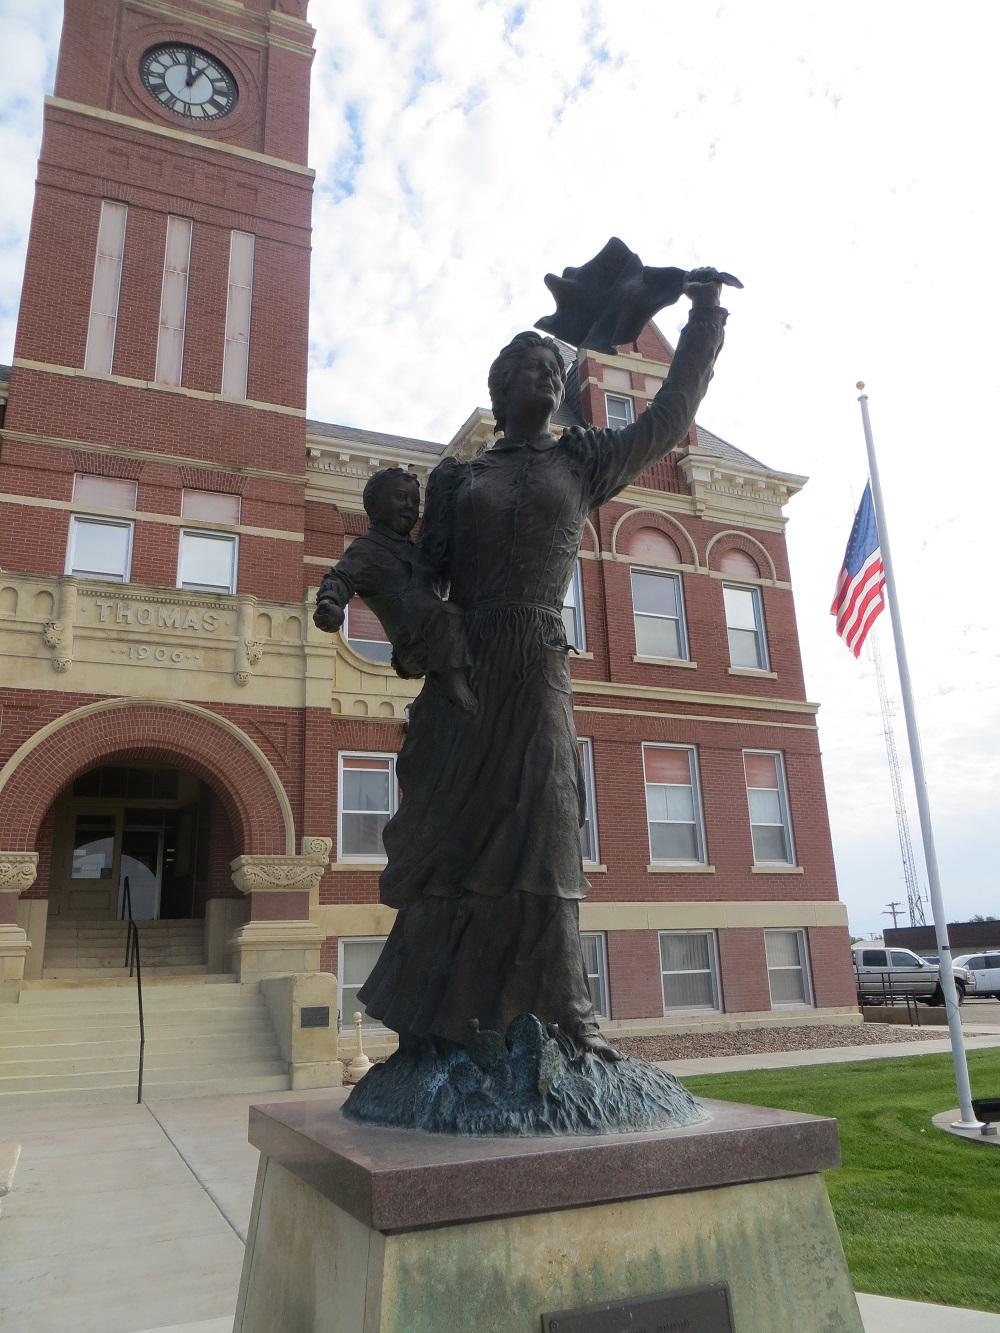 Spirit of the Prairie statue